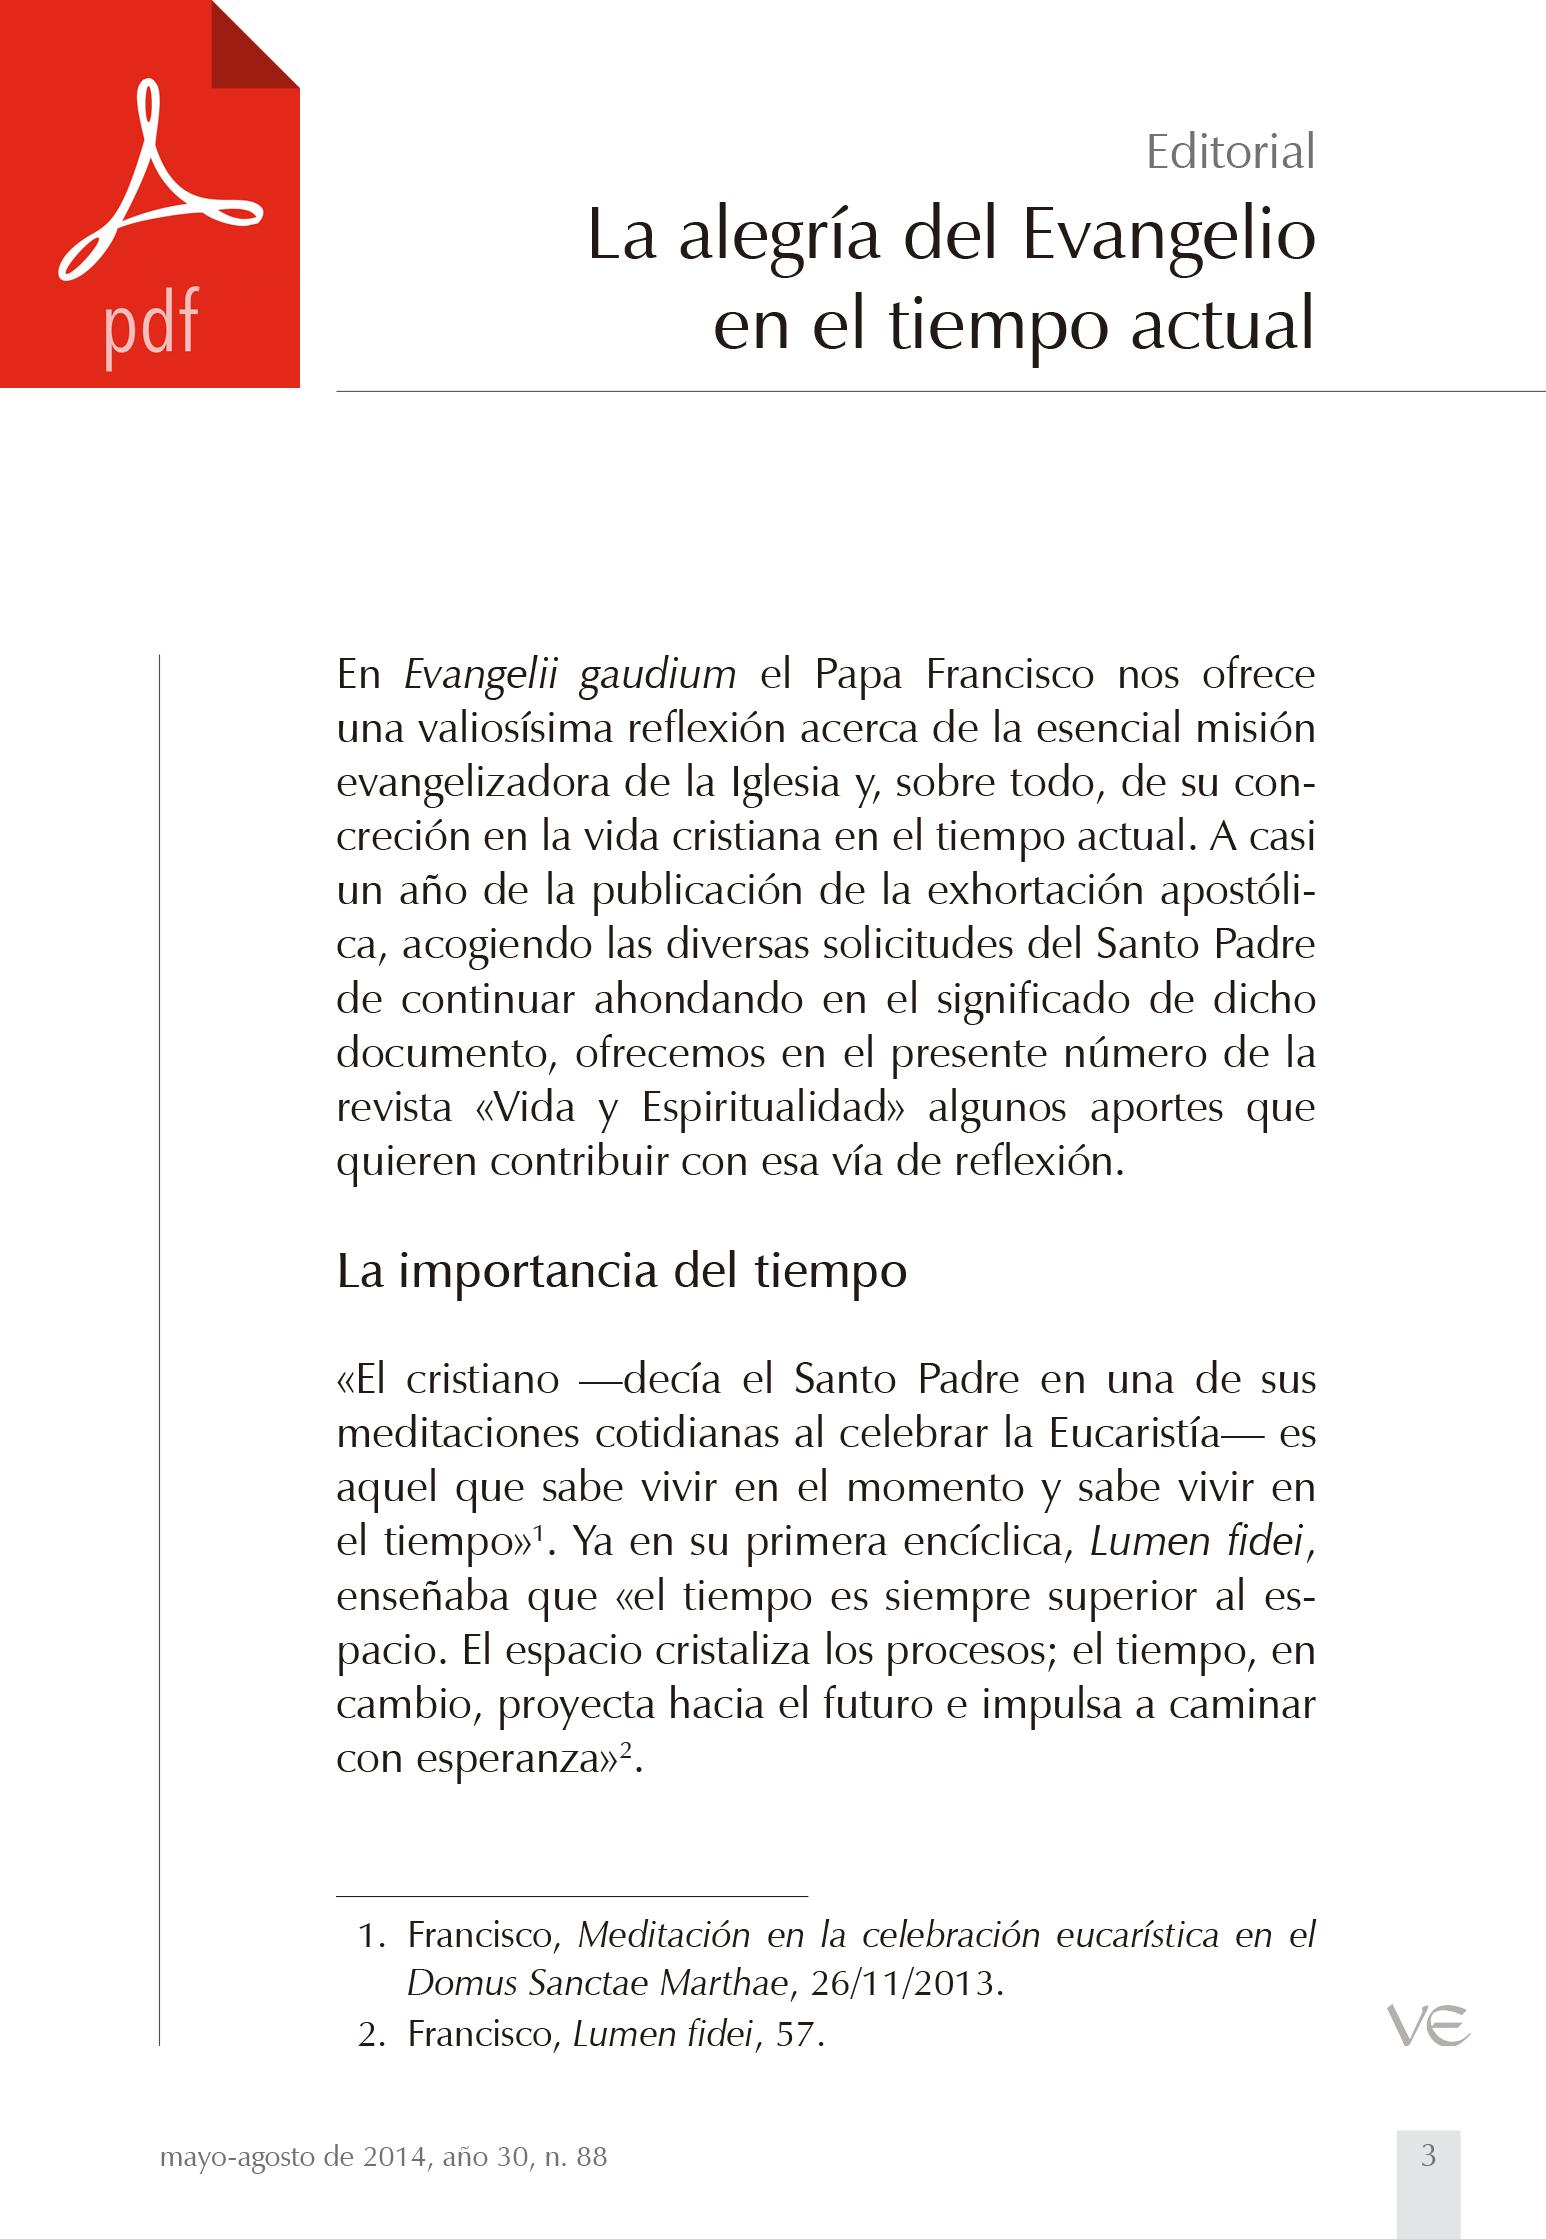 RevistaVE88 - Editorial pdf